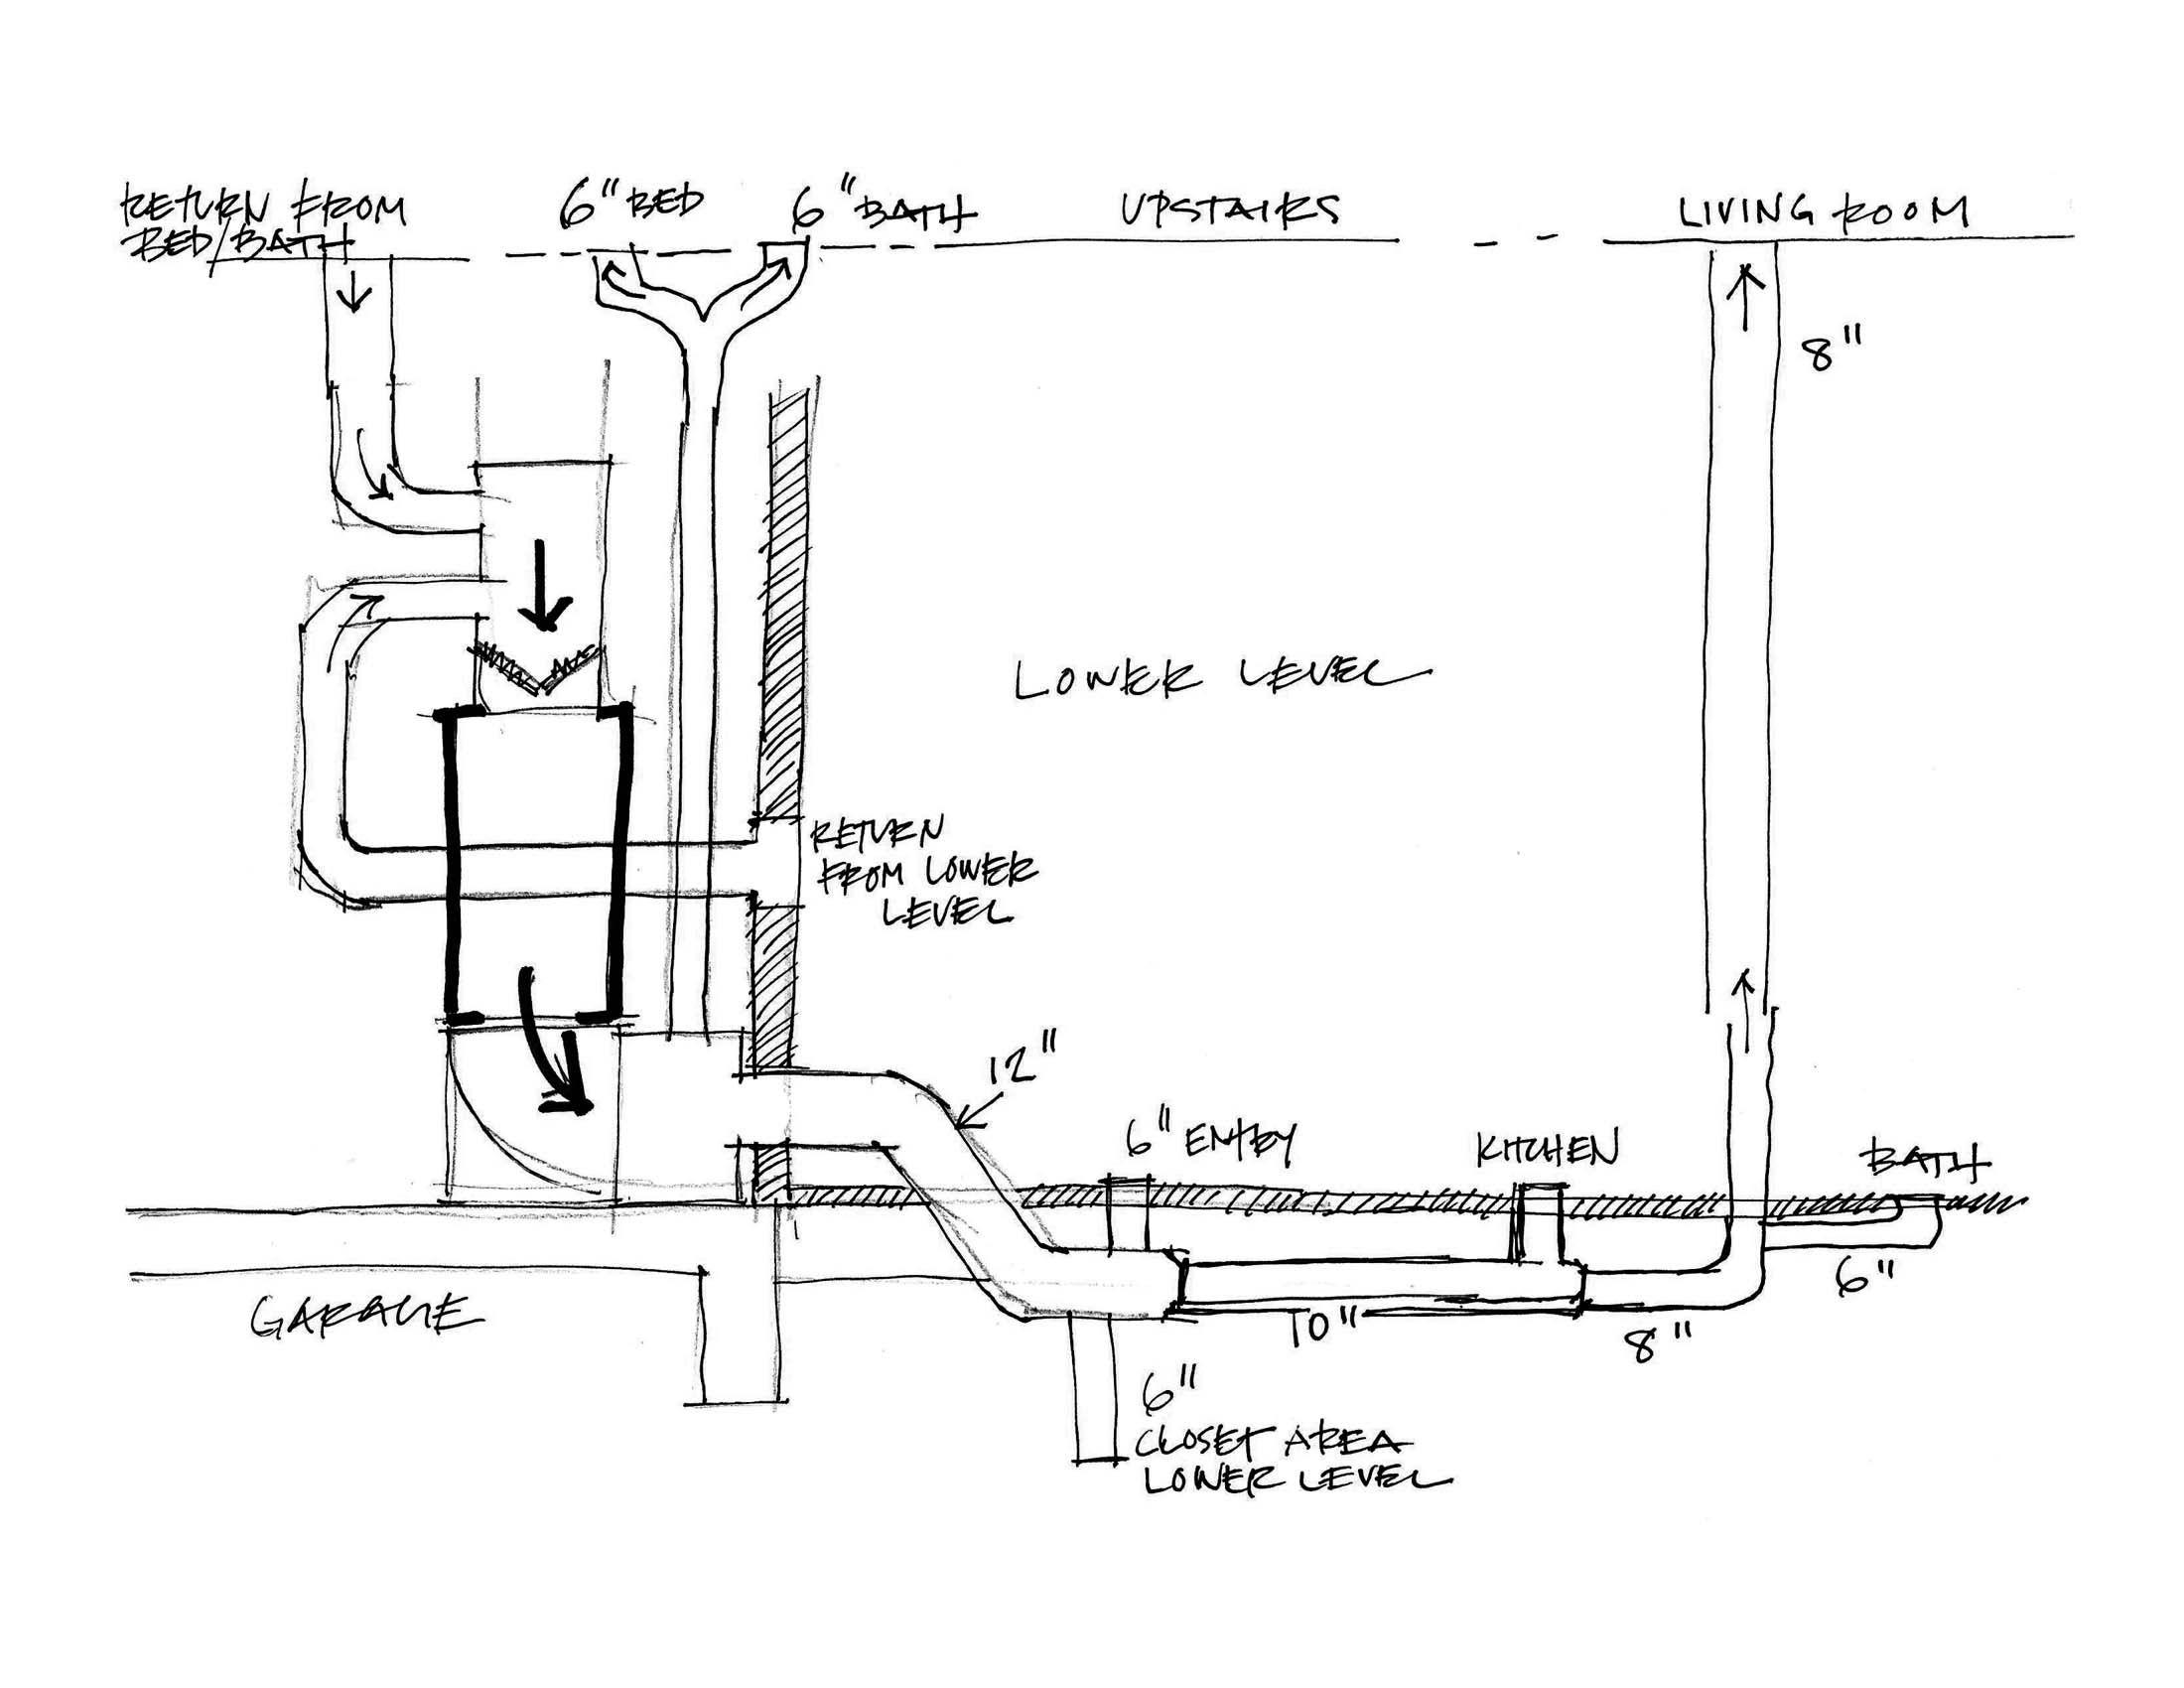 sketch diagram residential plumbing [ 2200 x 1700 Pixel ]